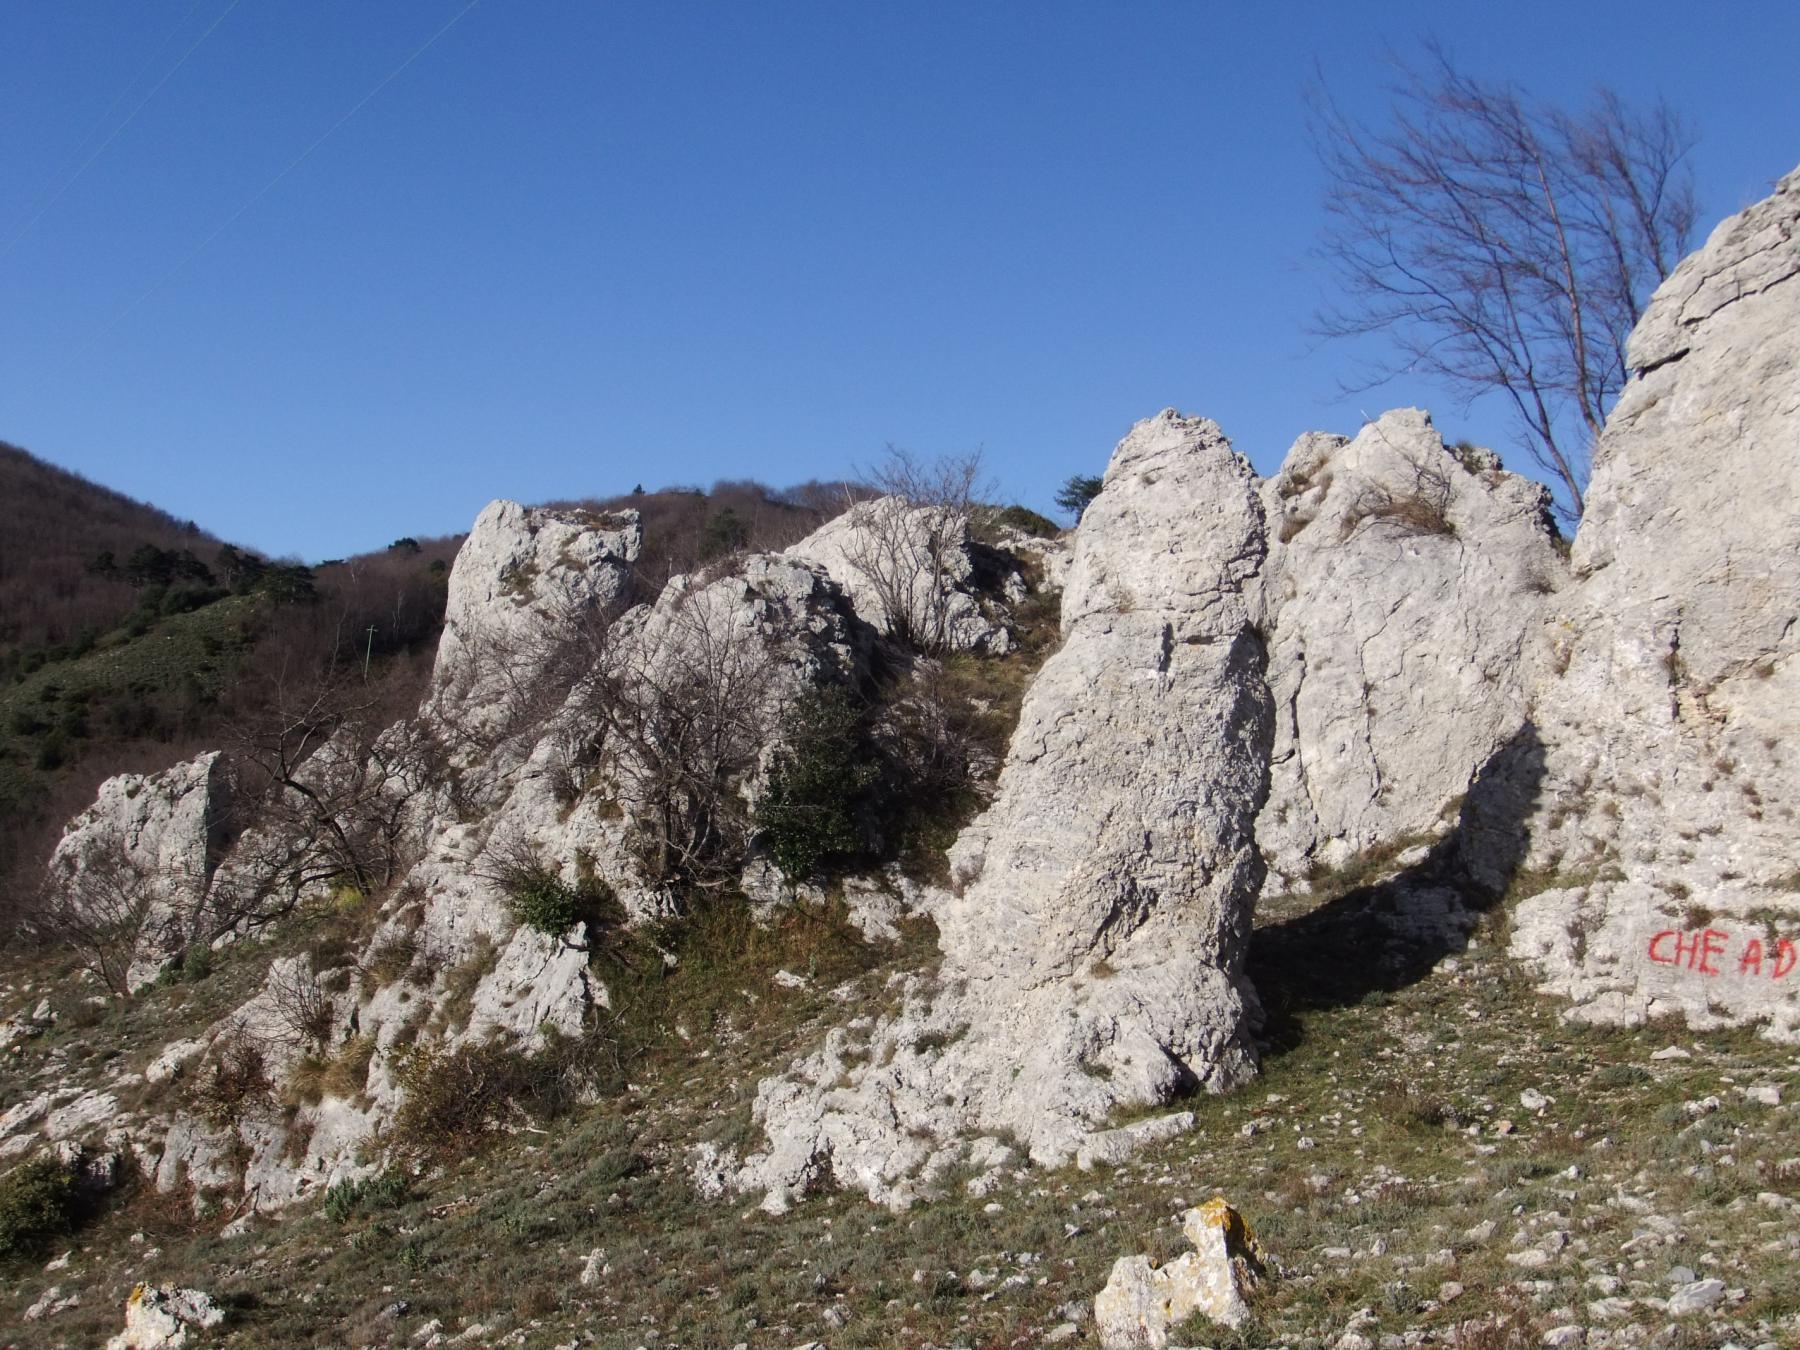 Gendarmi di pietra